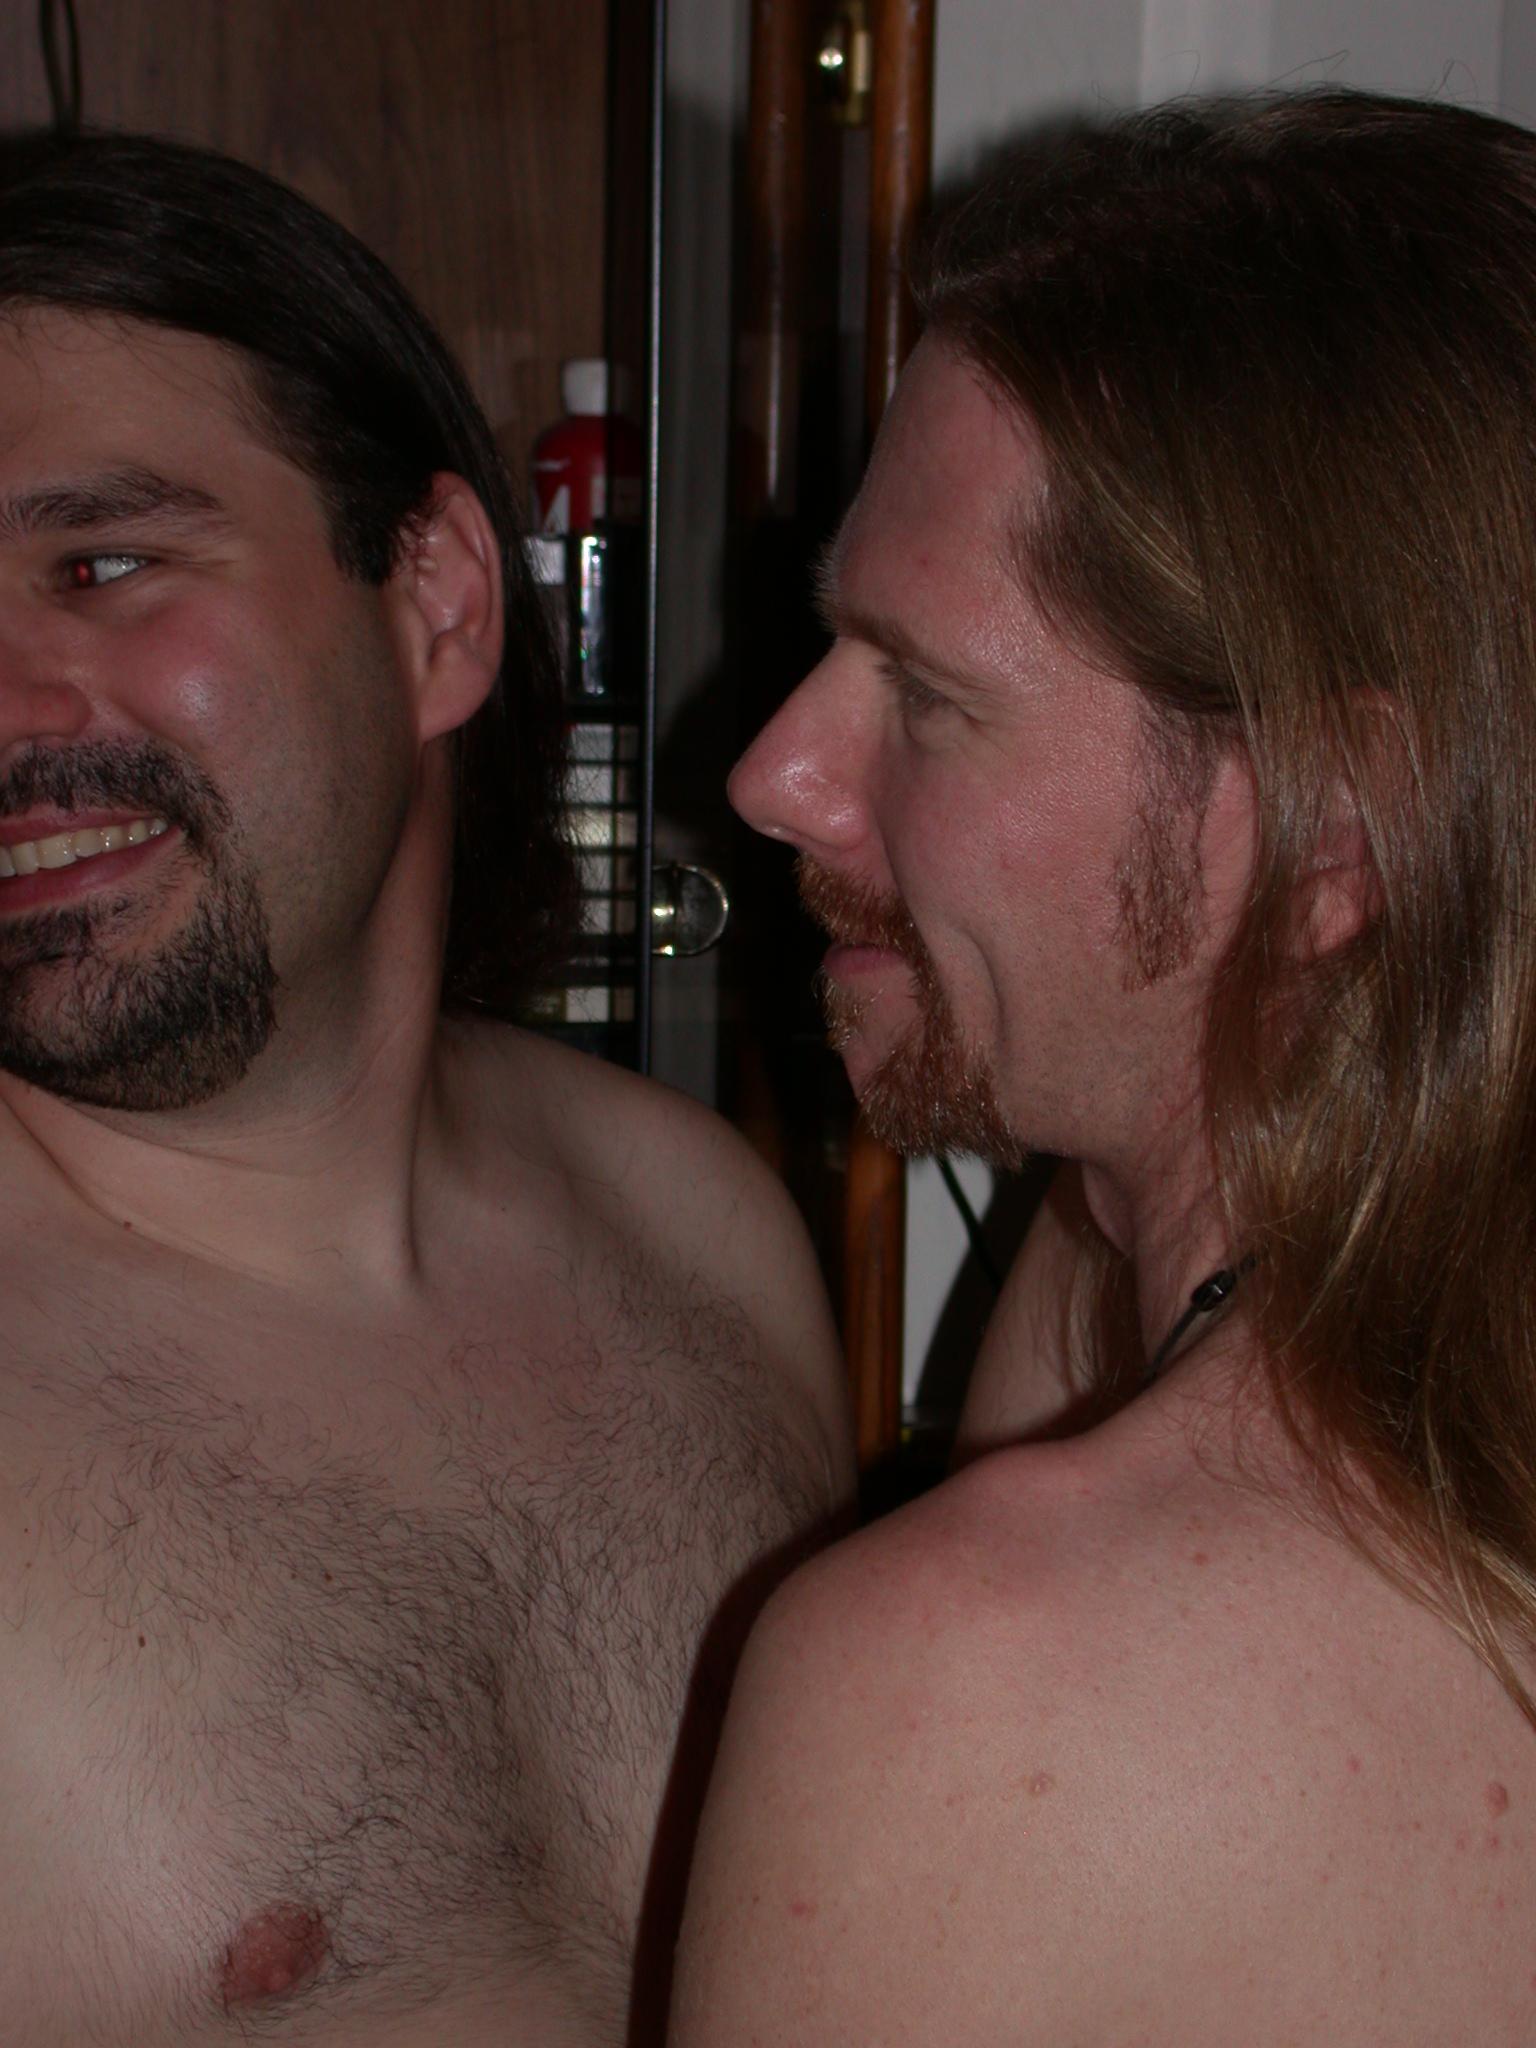 Half Brian and J Steve